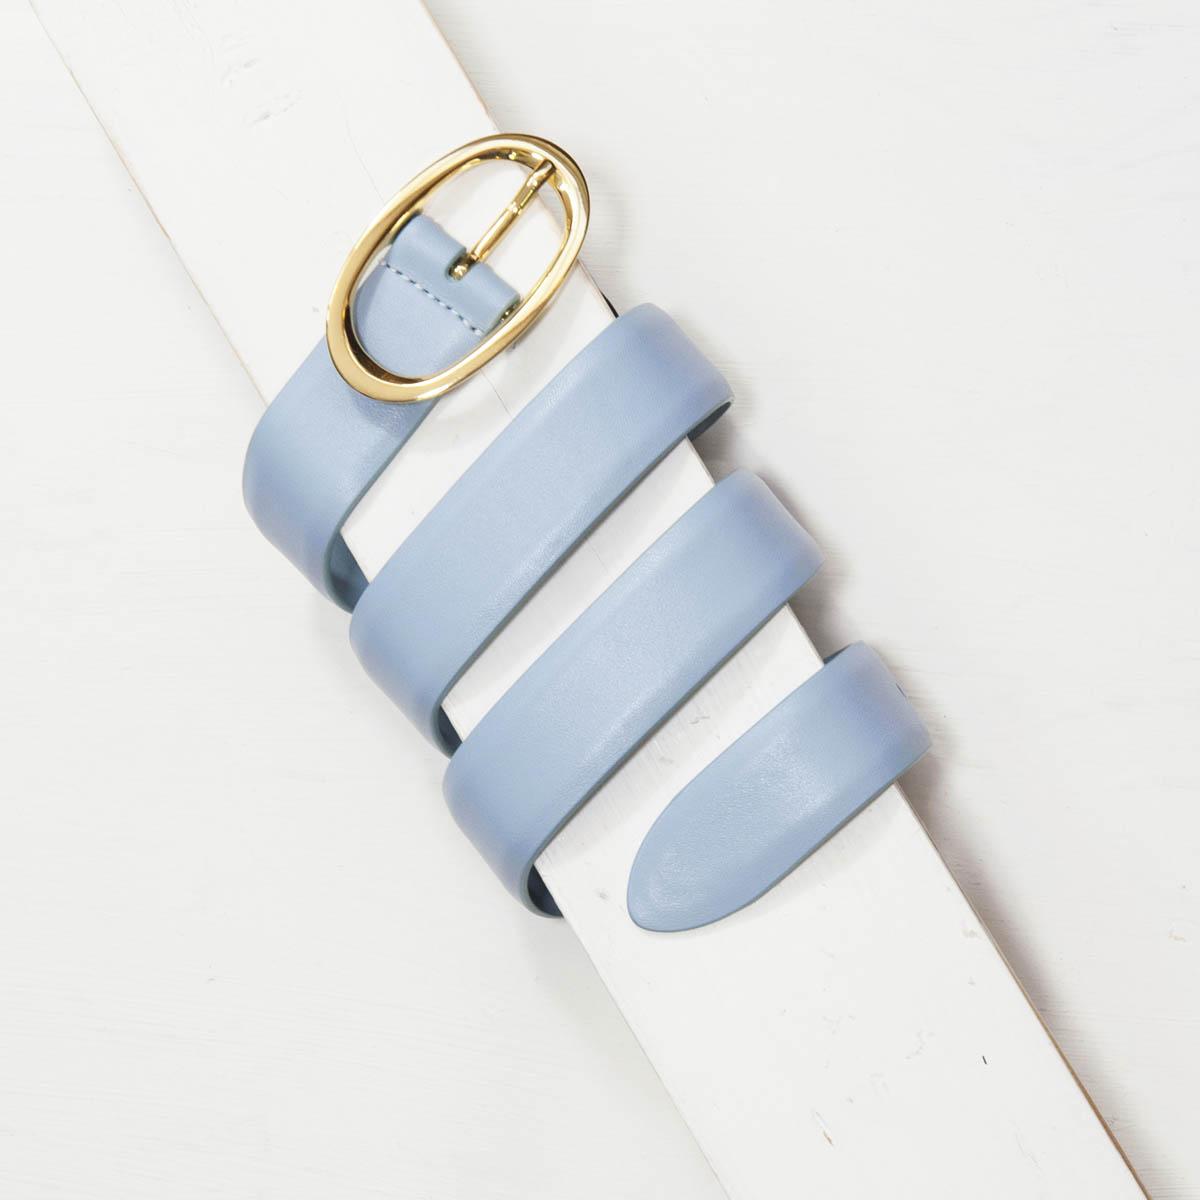 3,0 cm LIGHT BLUE NAPPA LEATHER BELT